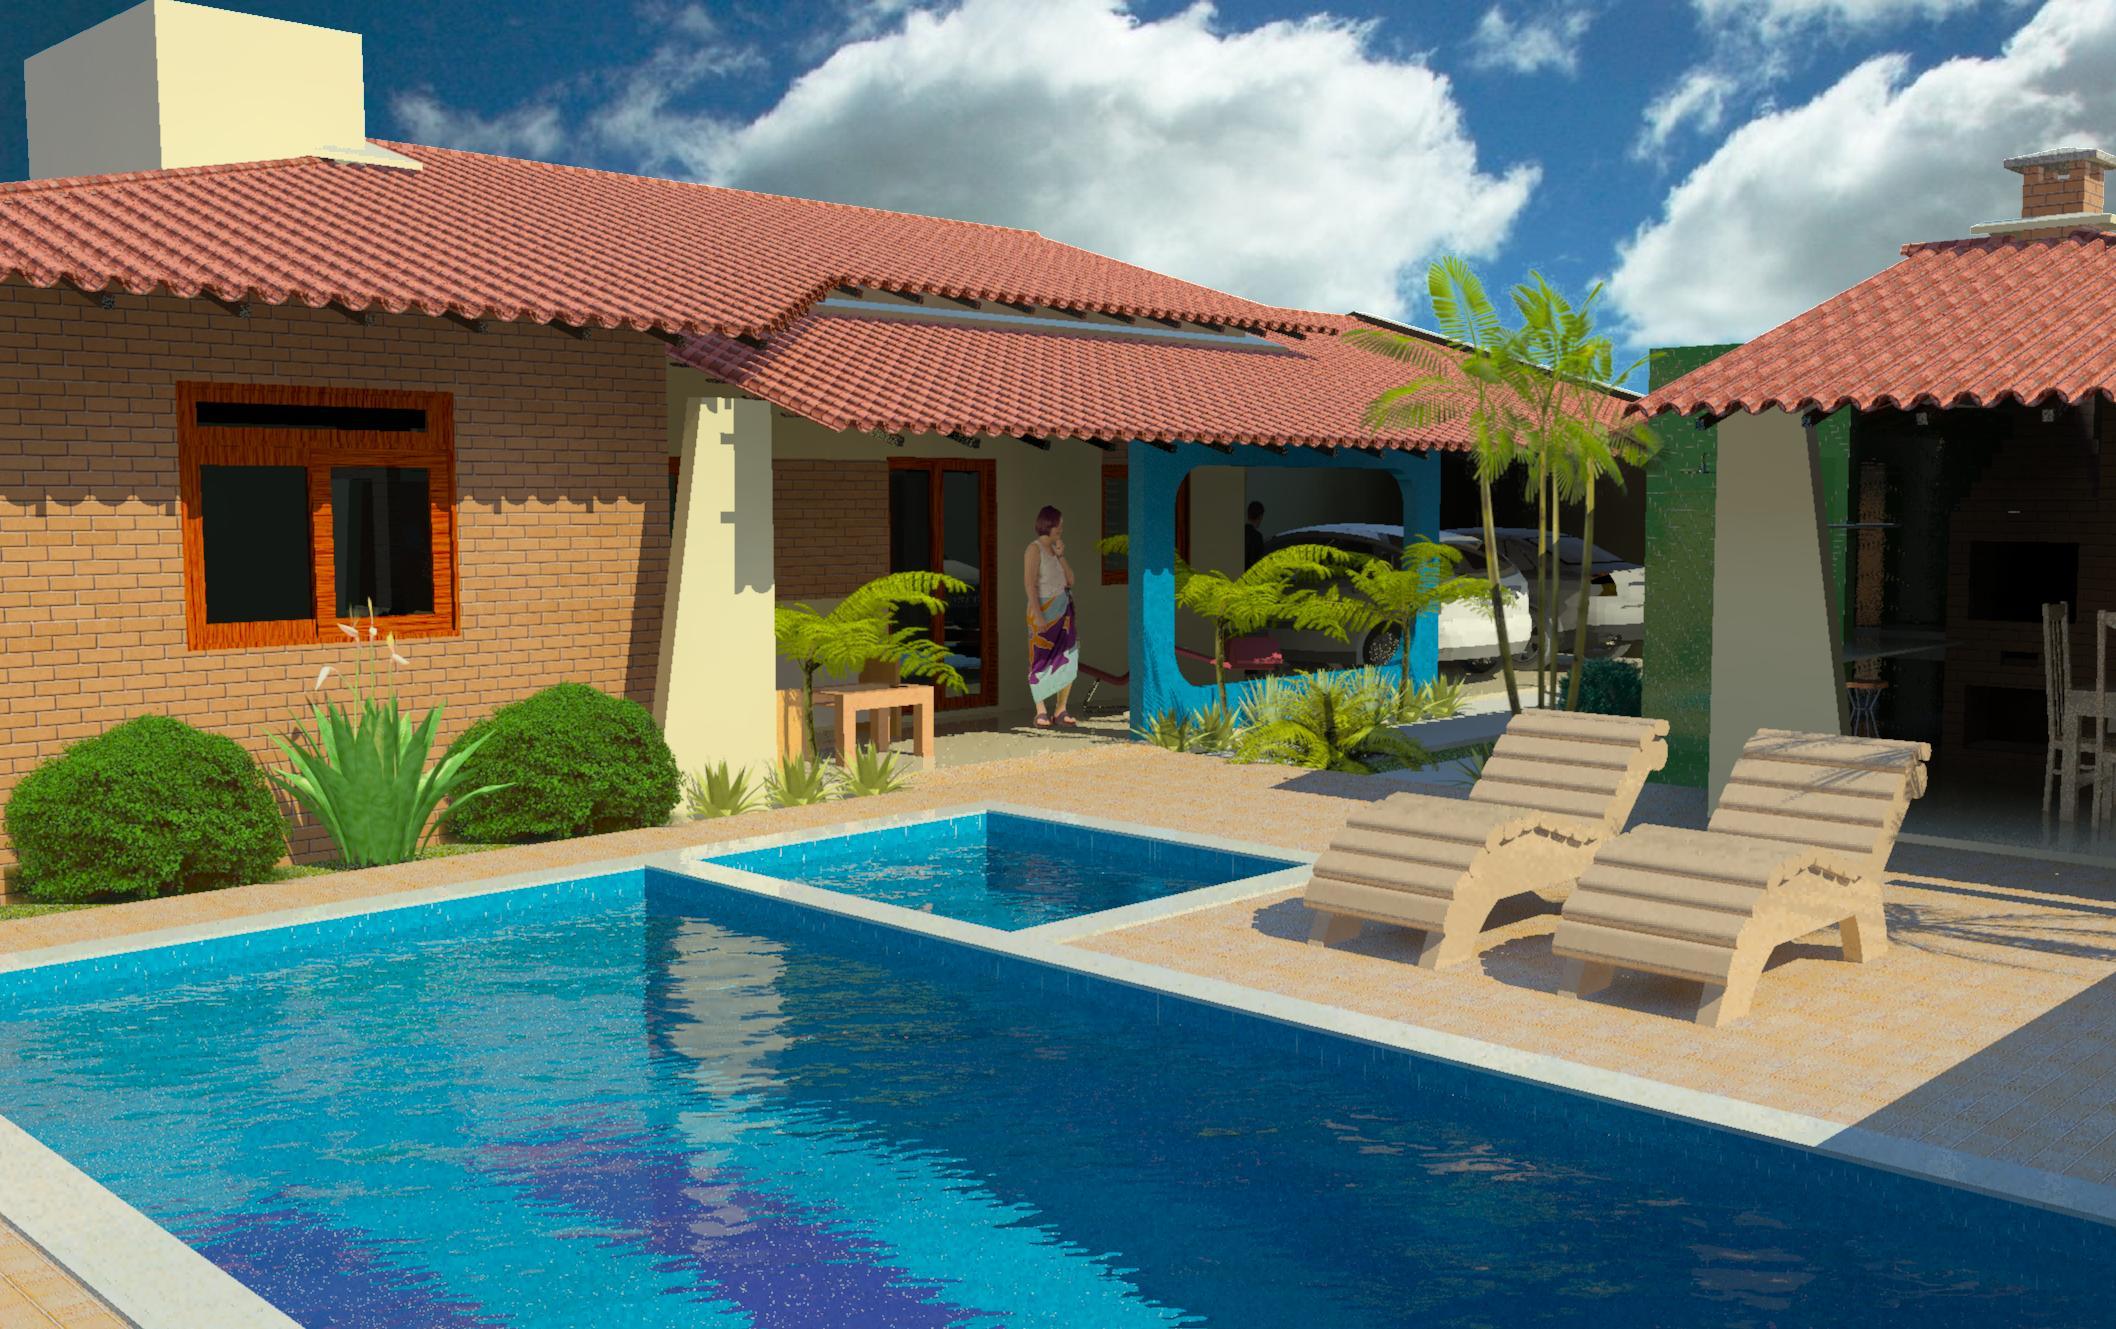 Casa com piscina descubra o conforto que pode causar for Piscinas dentro de casa